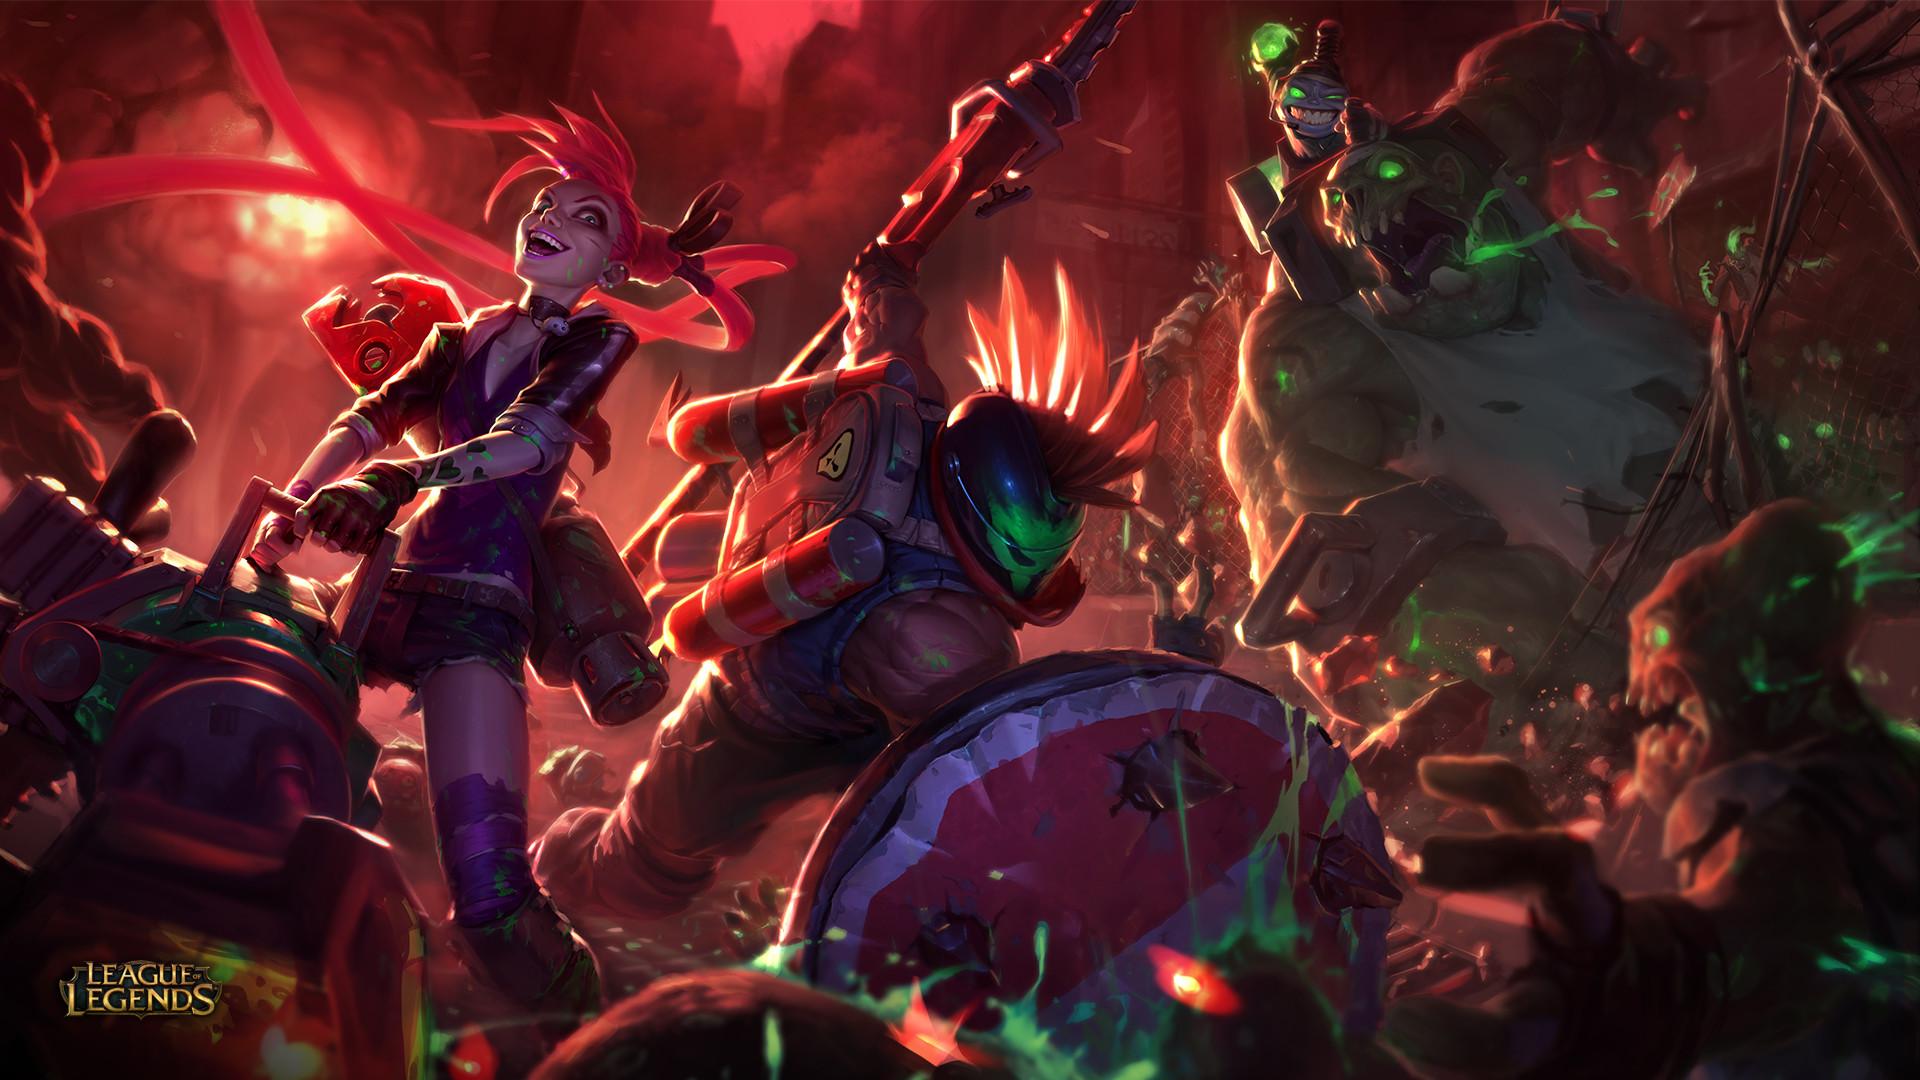 League Of Legends Jinx Wallpaper Posted By Zoey Peltier